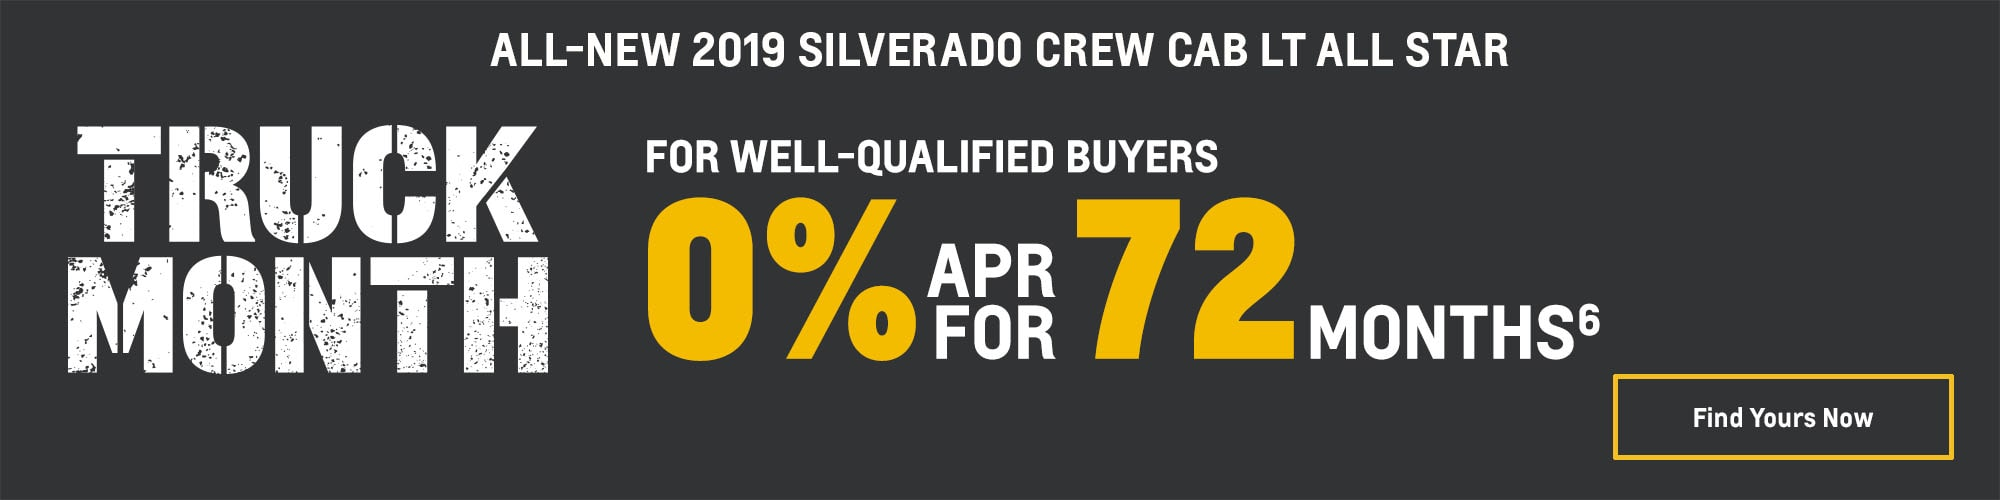 2019 Chevrolet Silverado 1500: 0% APR for 72 Months